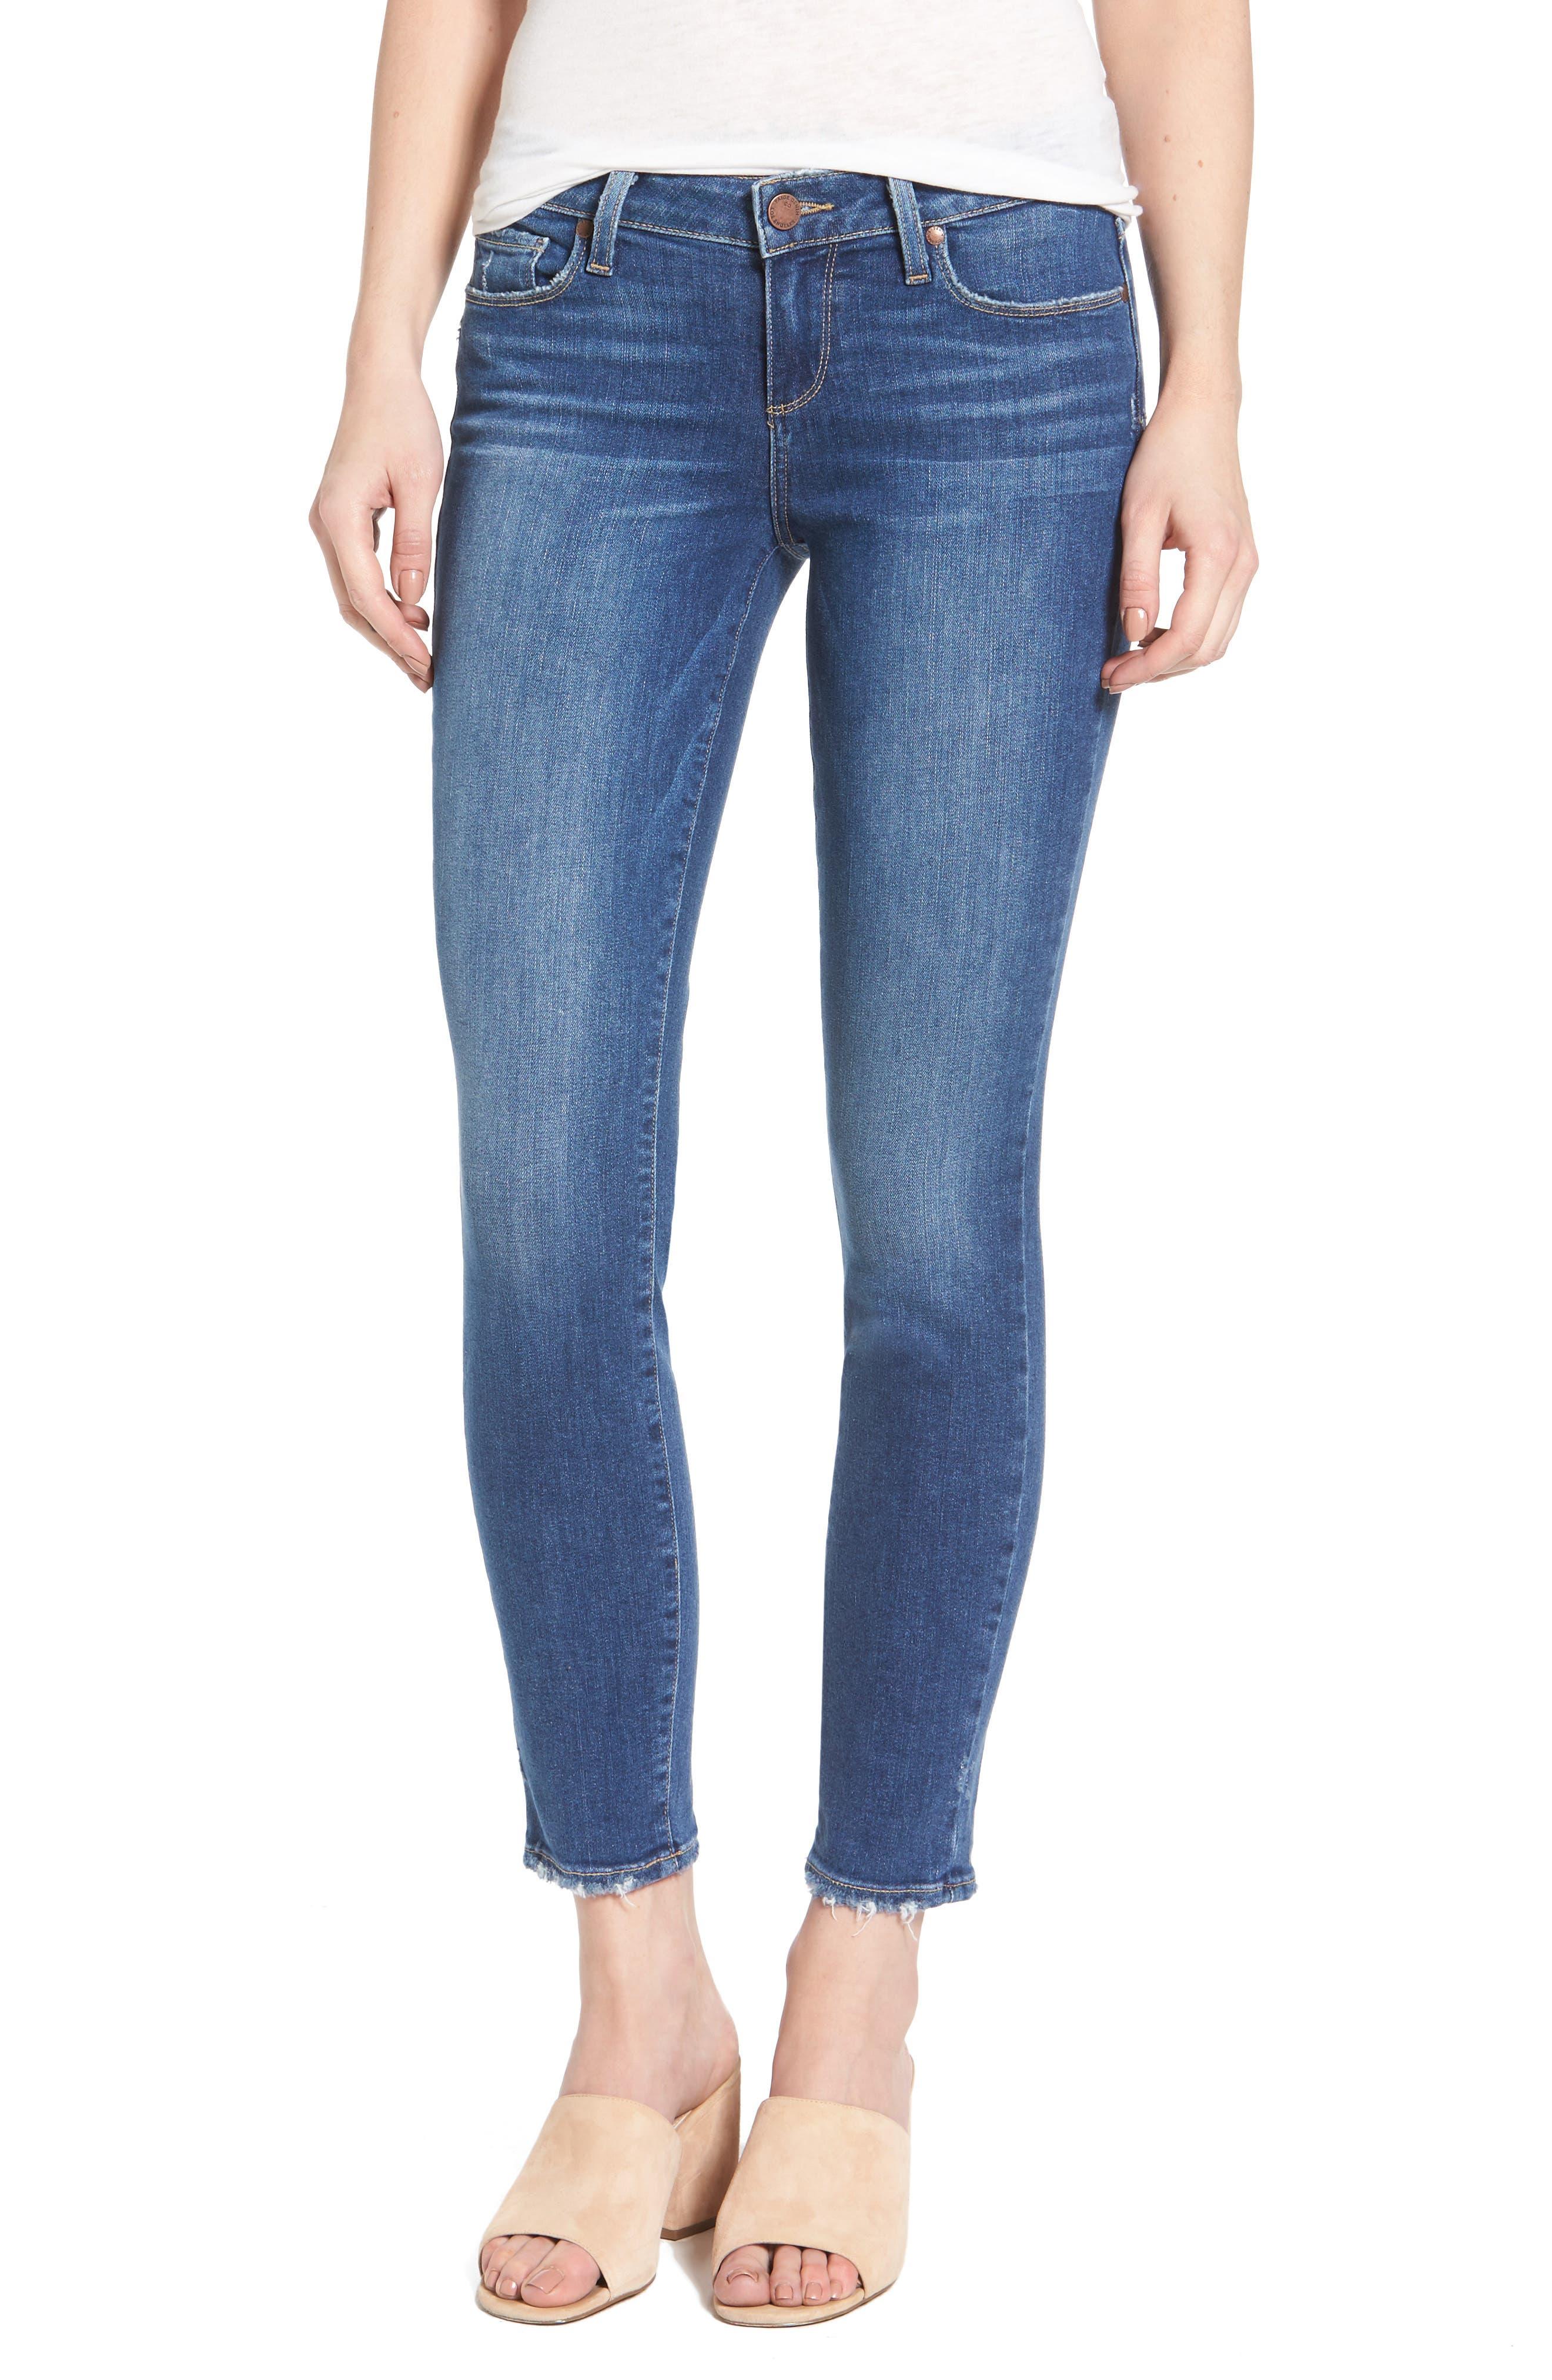 Main Image - PAIGE Verdugo Ankle Ultra Skinny Jeans (Bali)